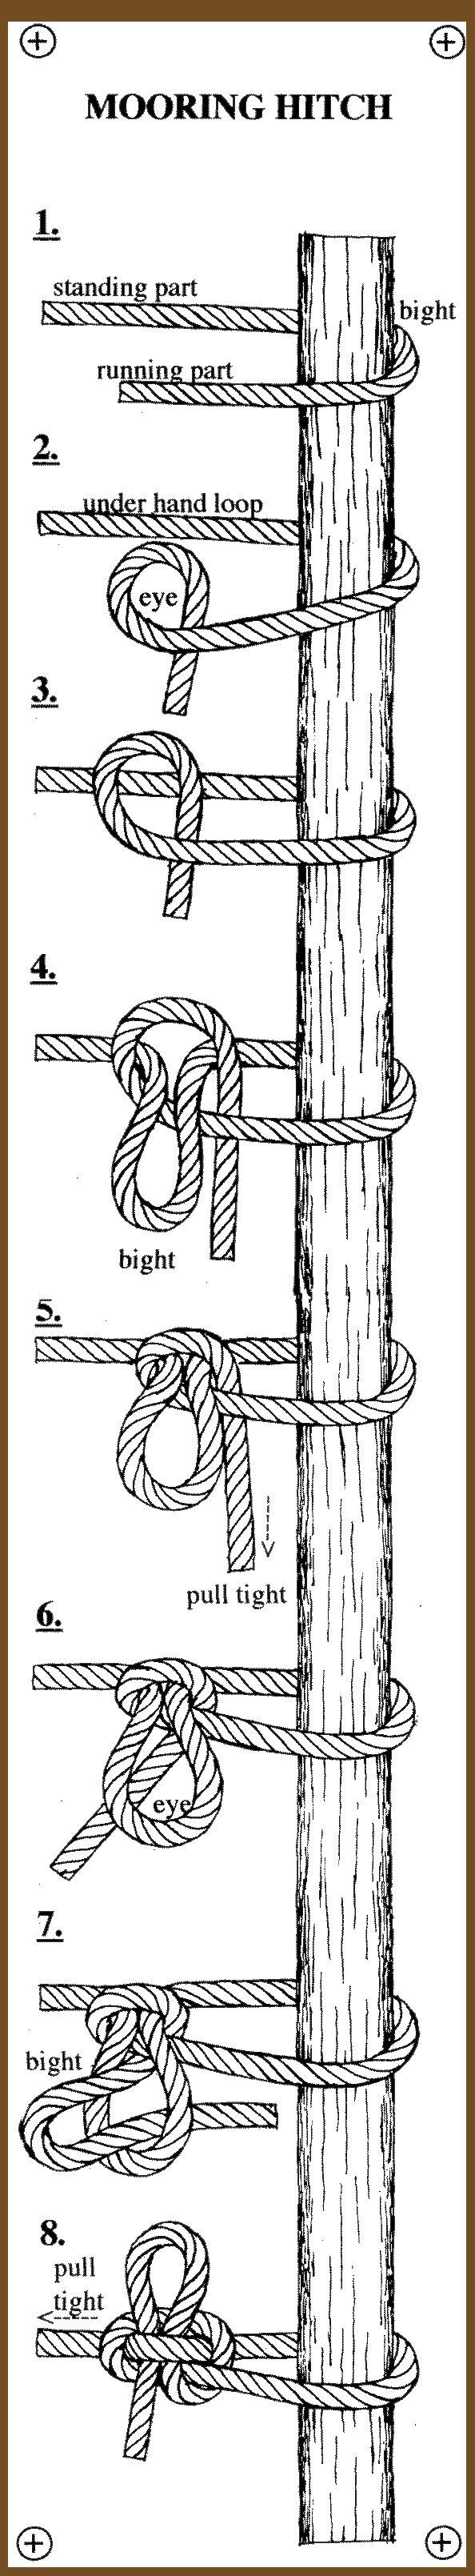 http://www.paracordist.com repin : mooring hitch #knot